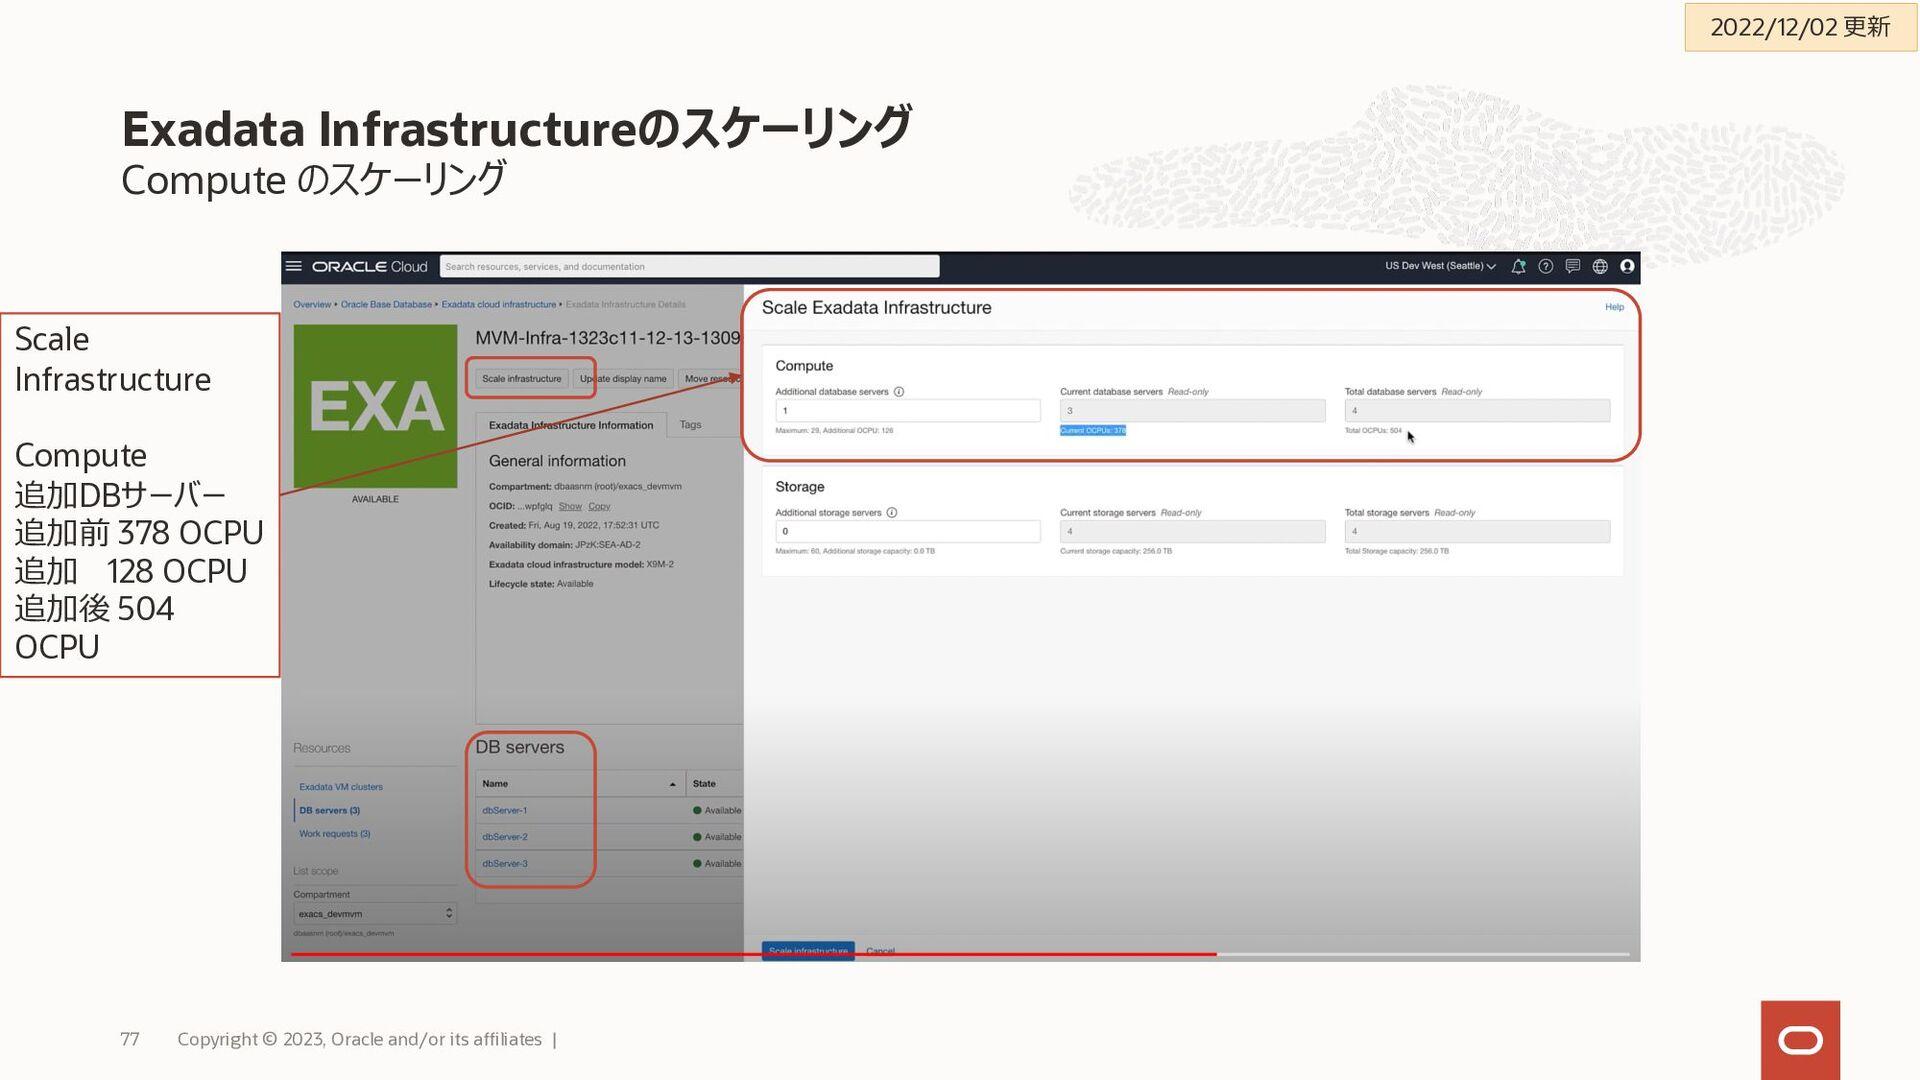 Oracle Cloud Infrastructure - SLA: サービスと対象範囲 Co...